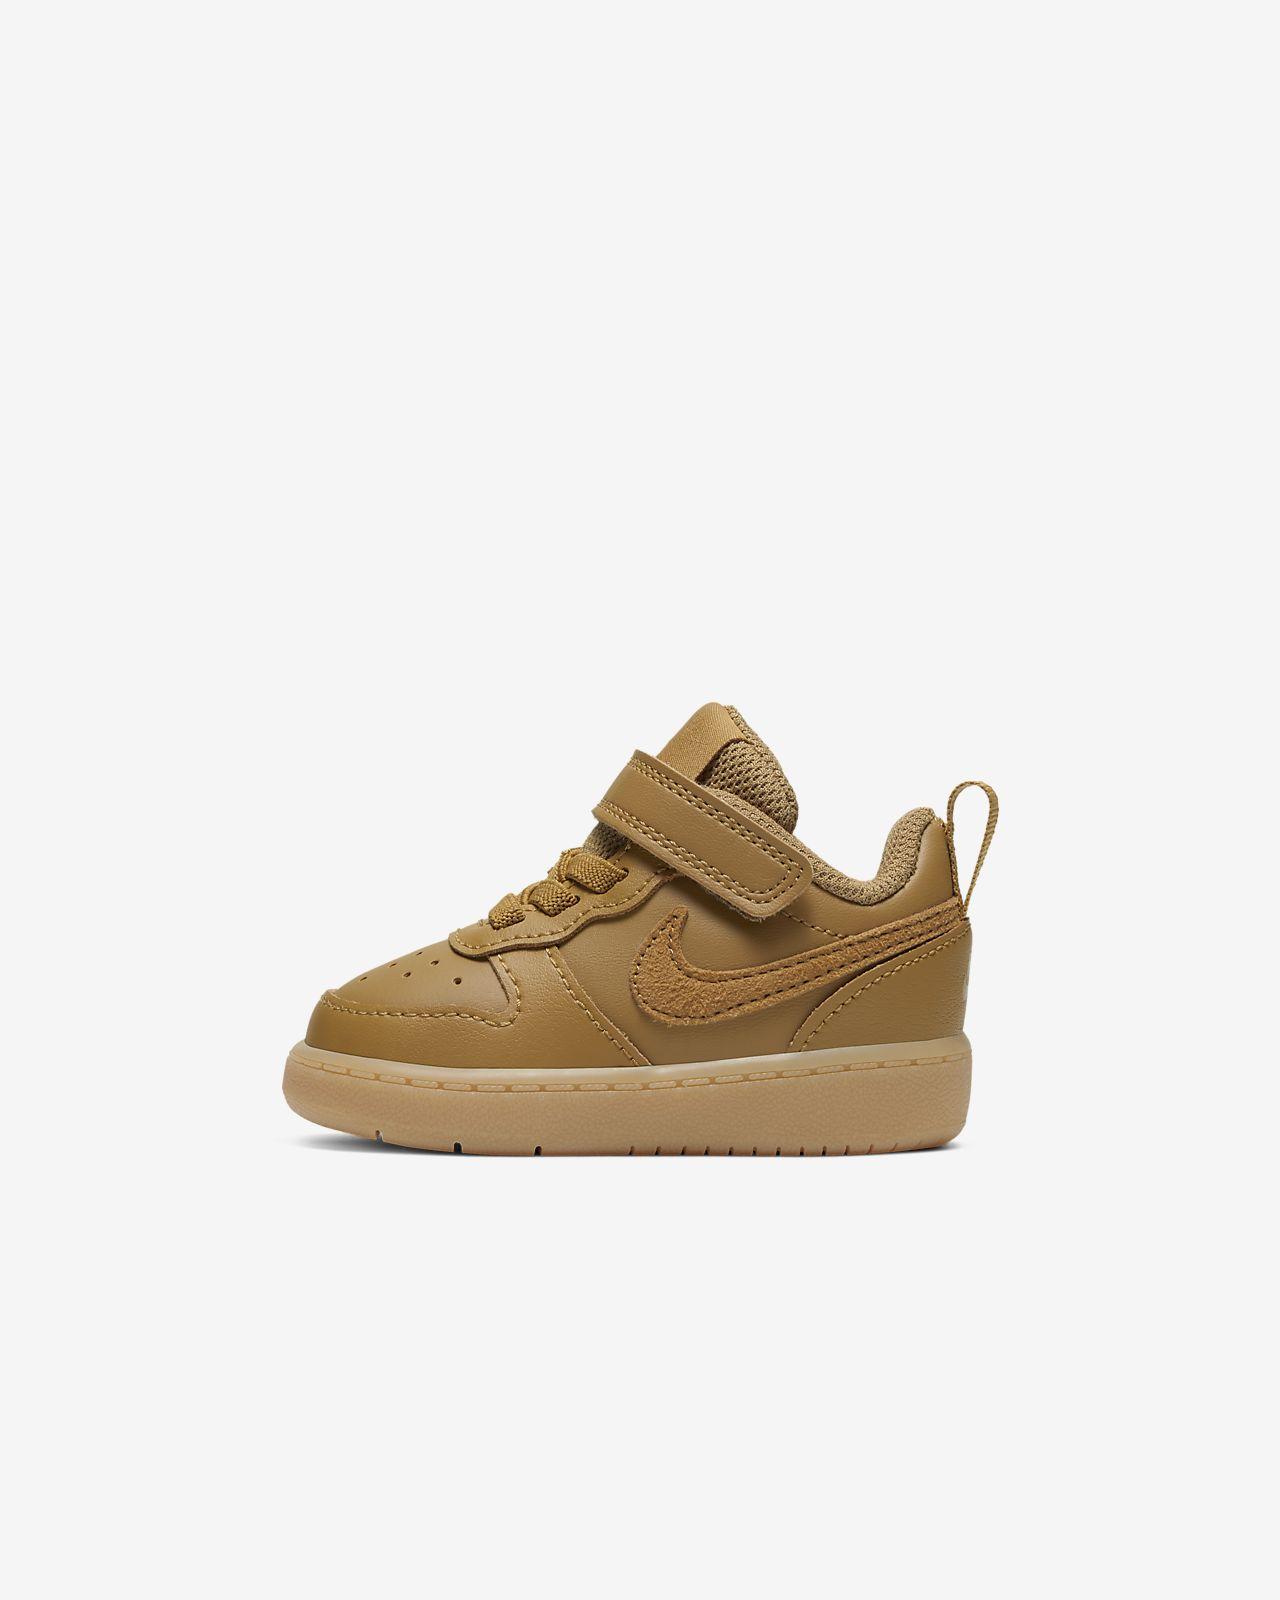 Sko Nike Court Borough Low 2 för baby/små barn